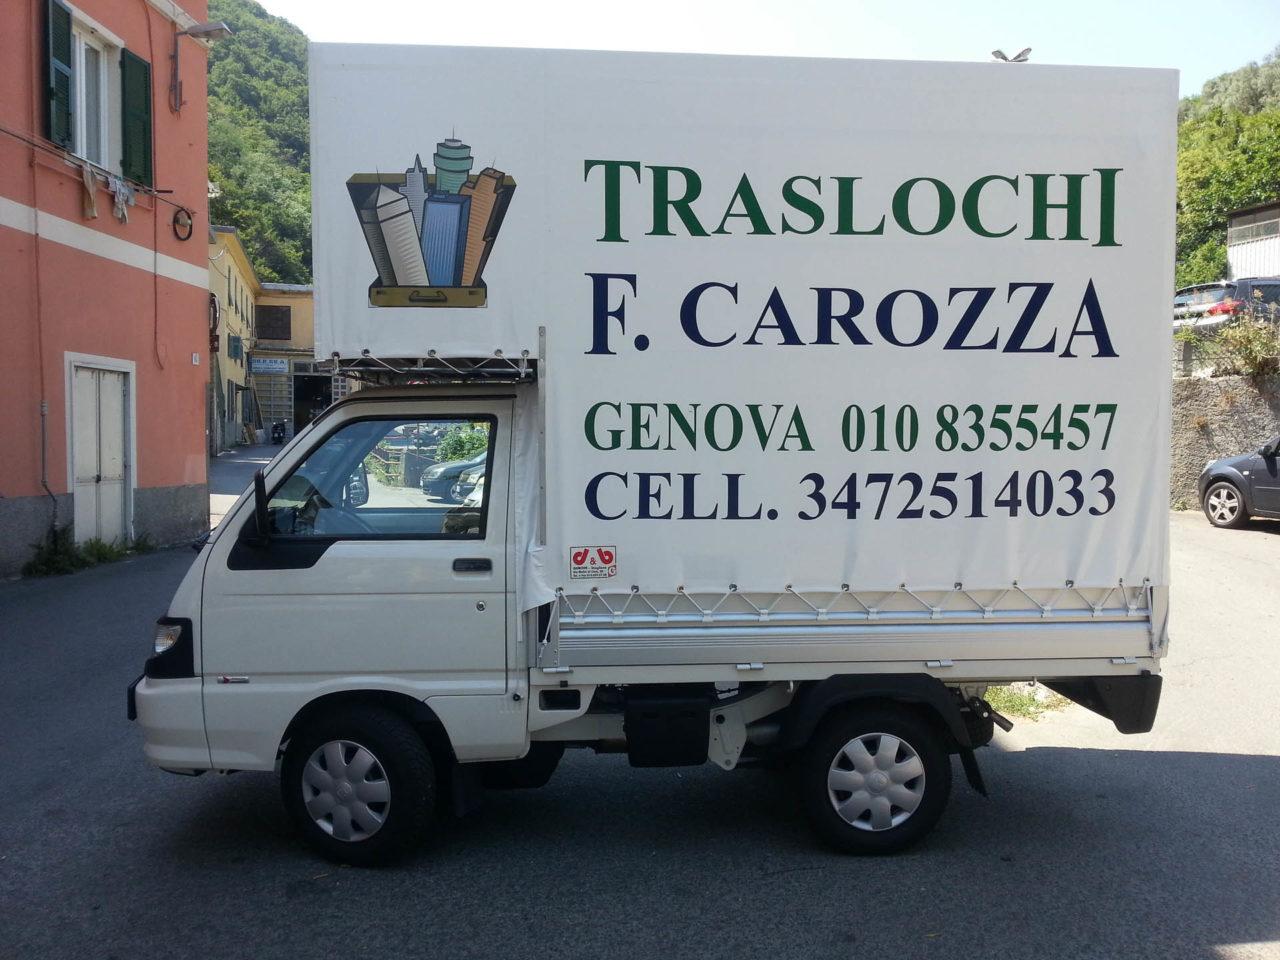 Traslochi Carozza Fiorenzo Genova-51